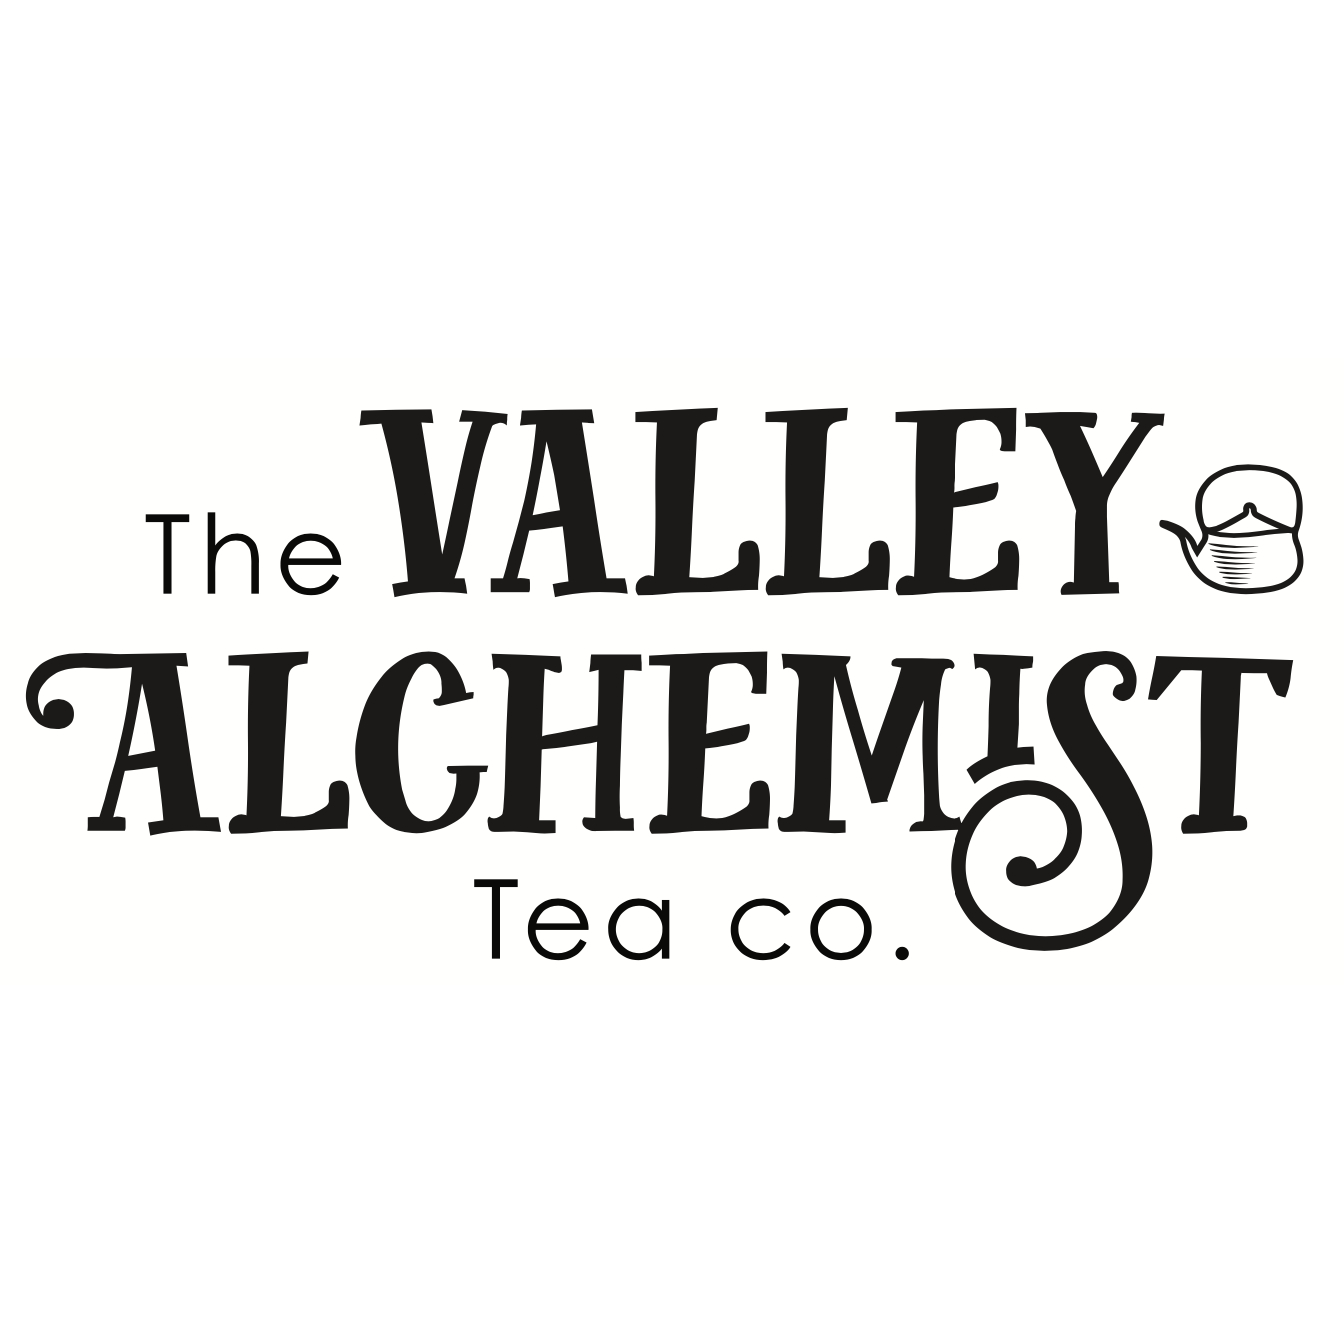 The Valley Alchemist Tea Co